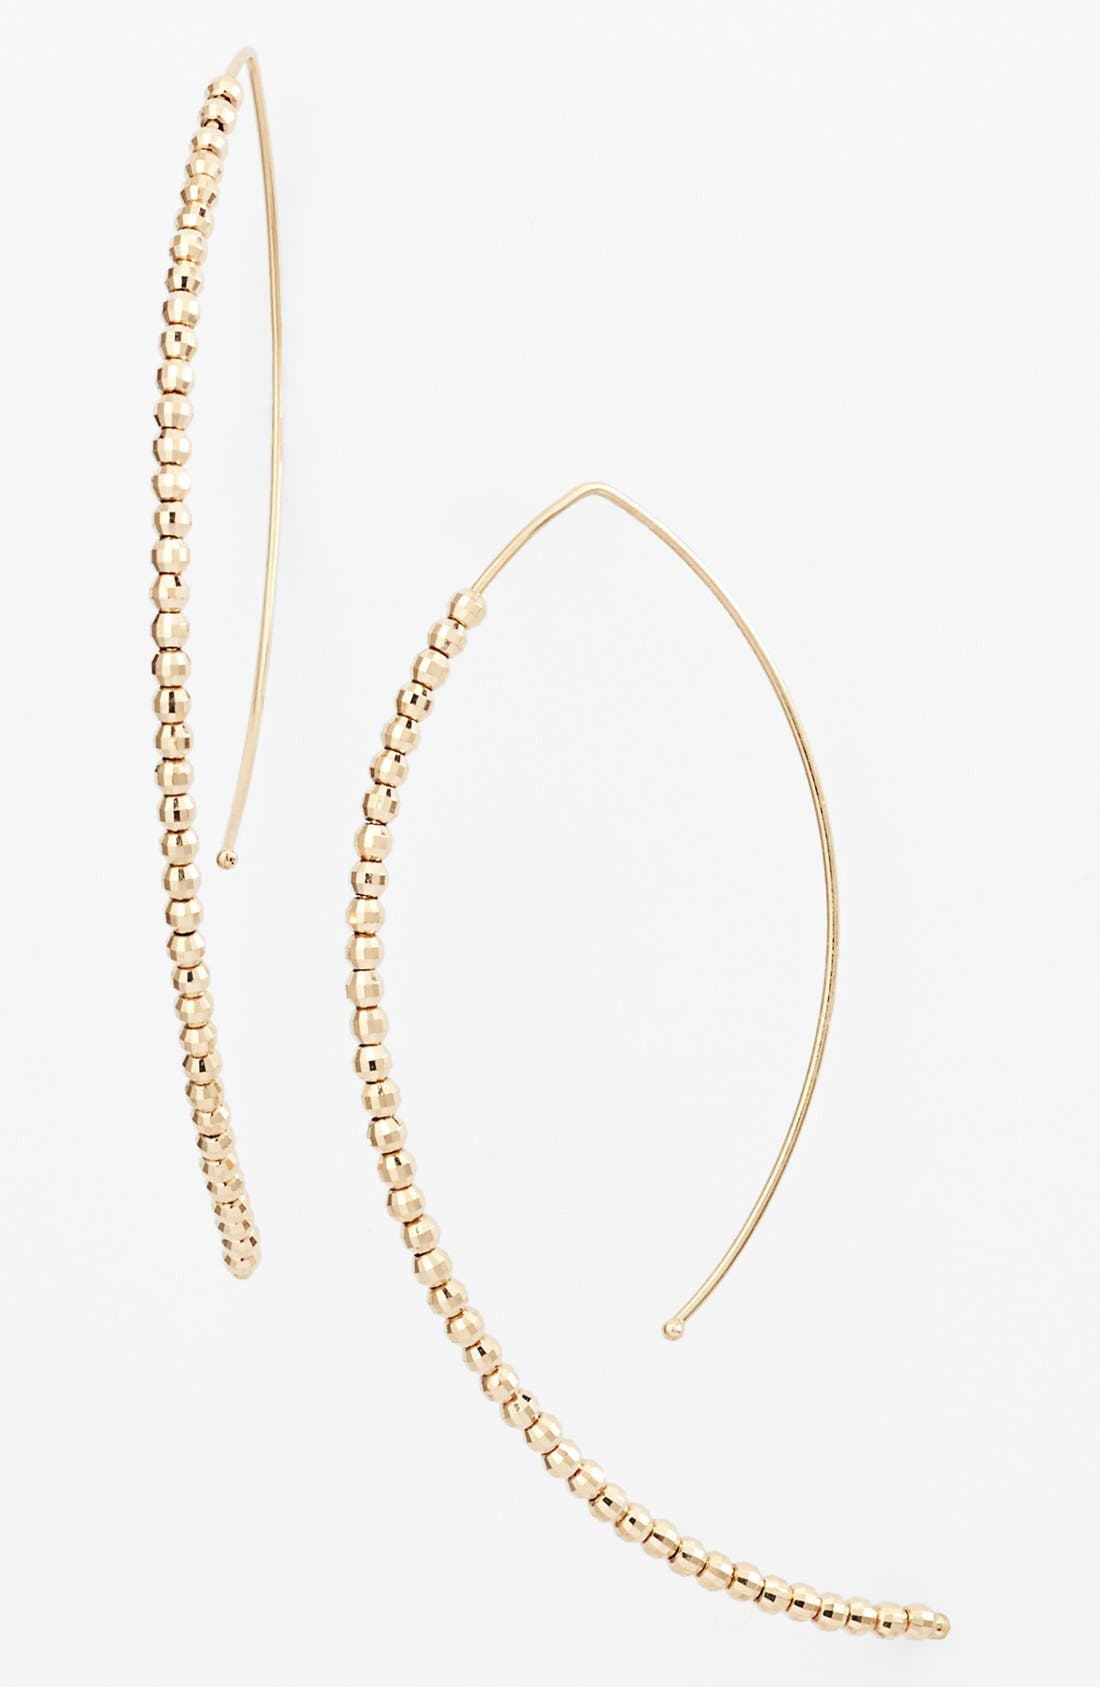 Alternate Image 1 Selected - Mizuki 'Cut Beads' Open Hoop Earrings